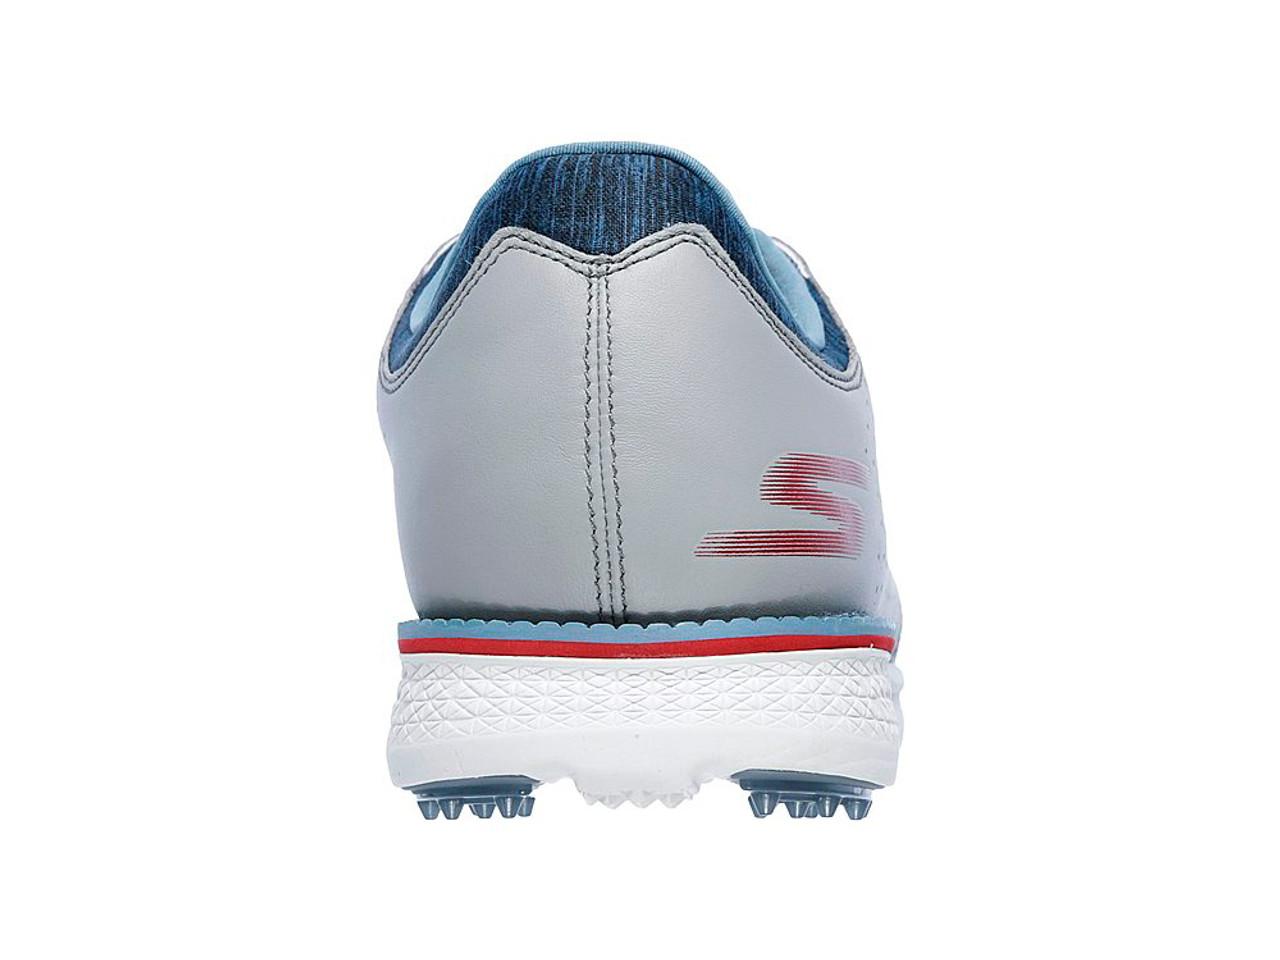 Skechers Go Golf Elite 3 Approach LX